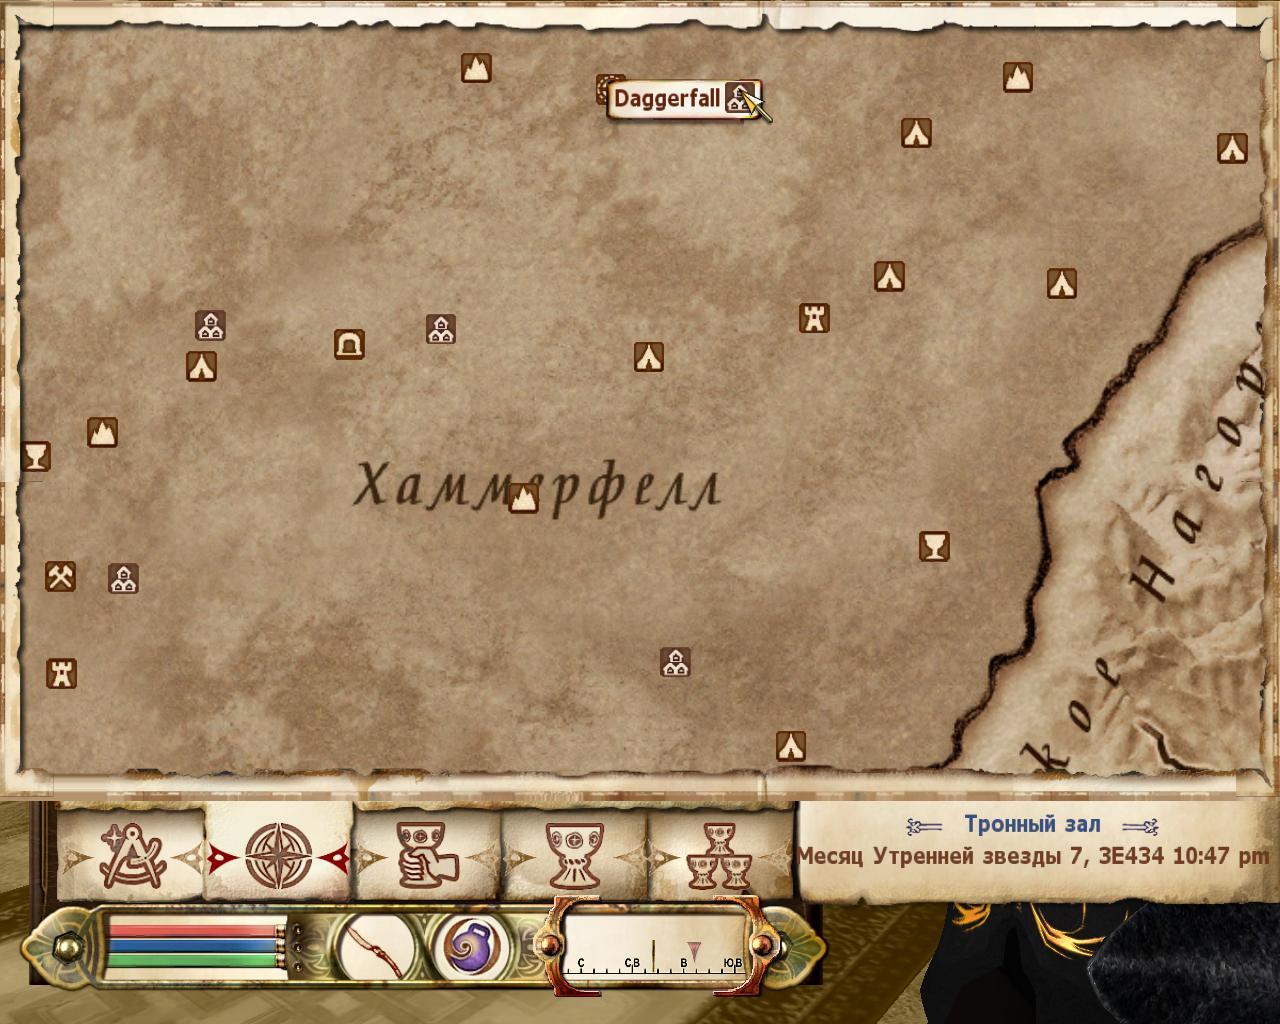 Oblivion mod manager 1 1 12 rus скачать